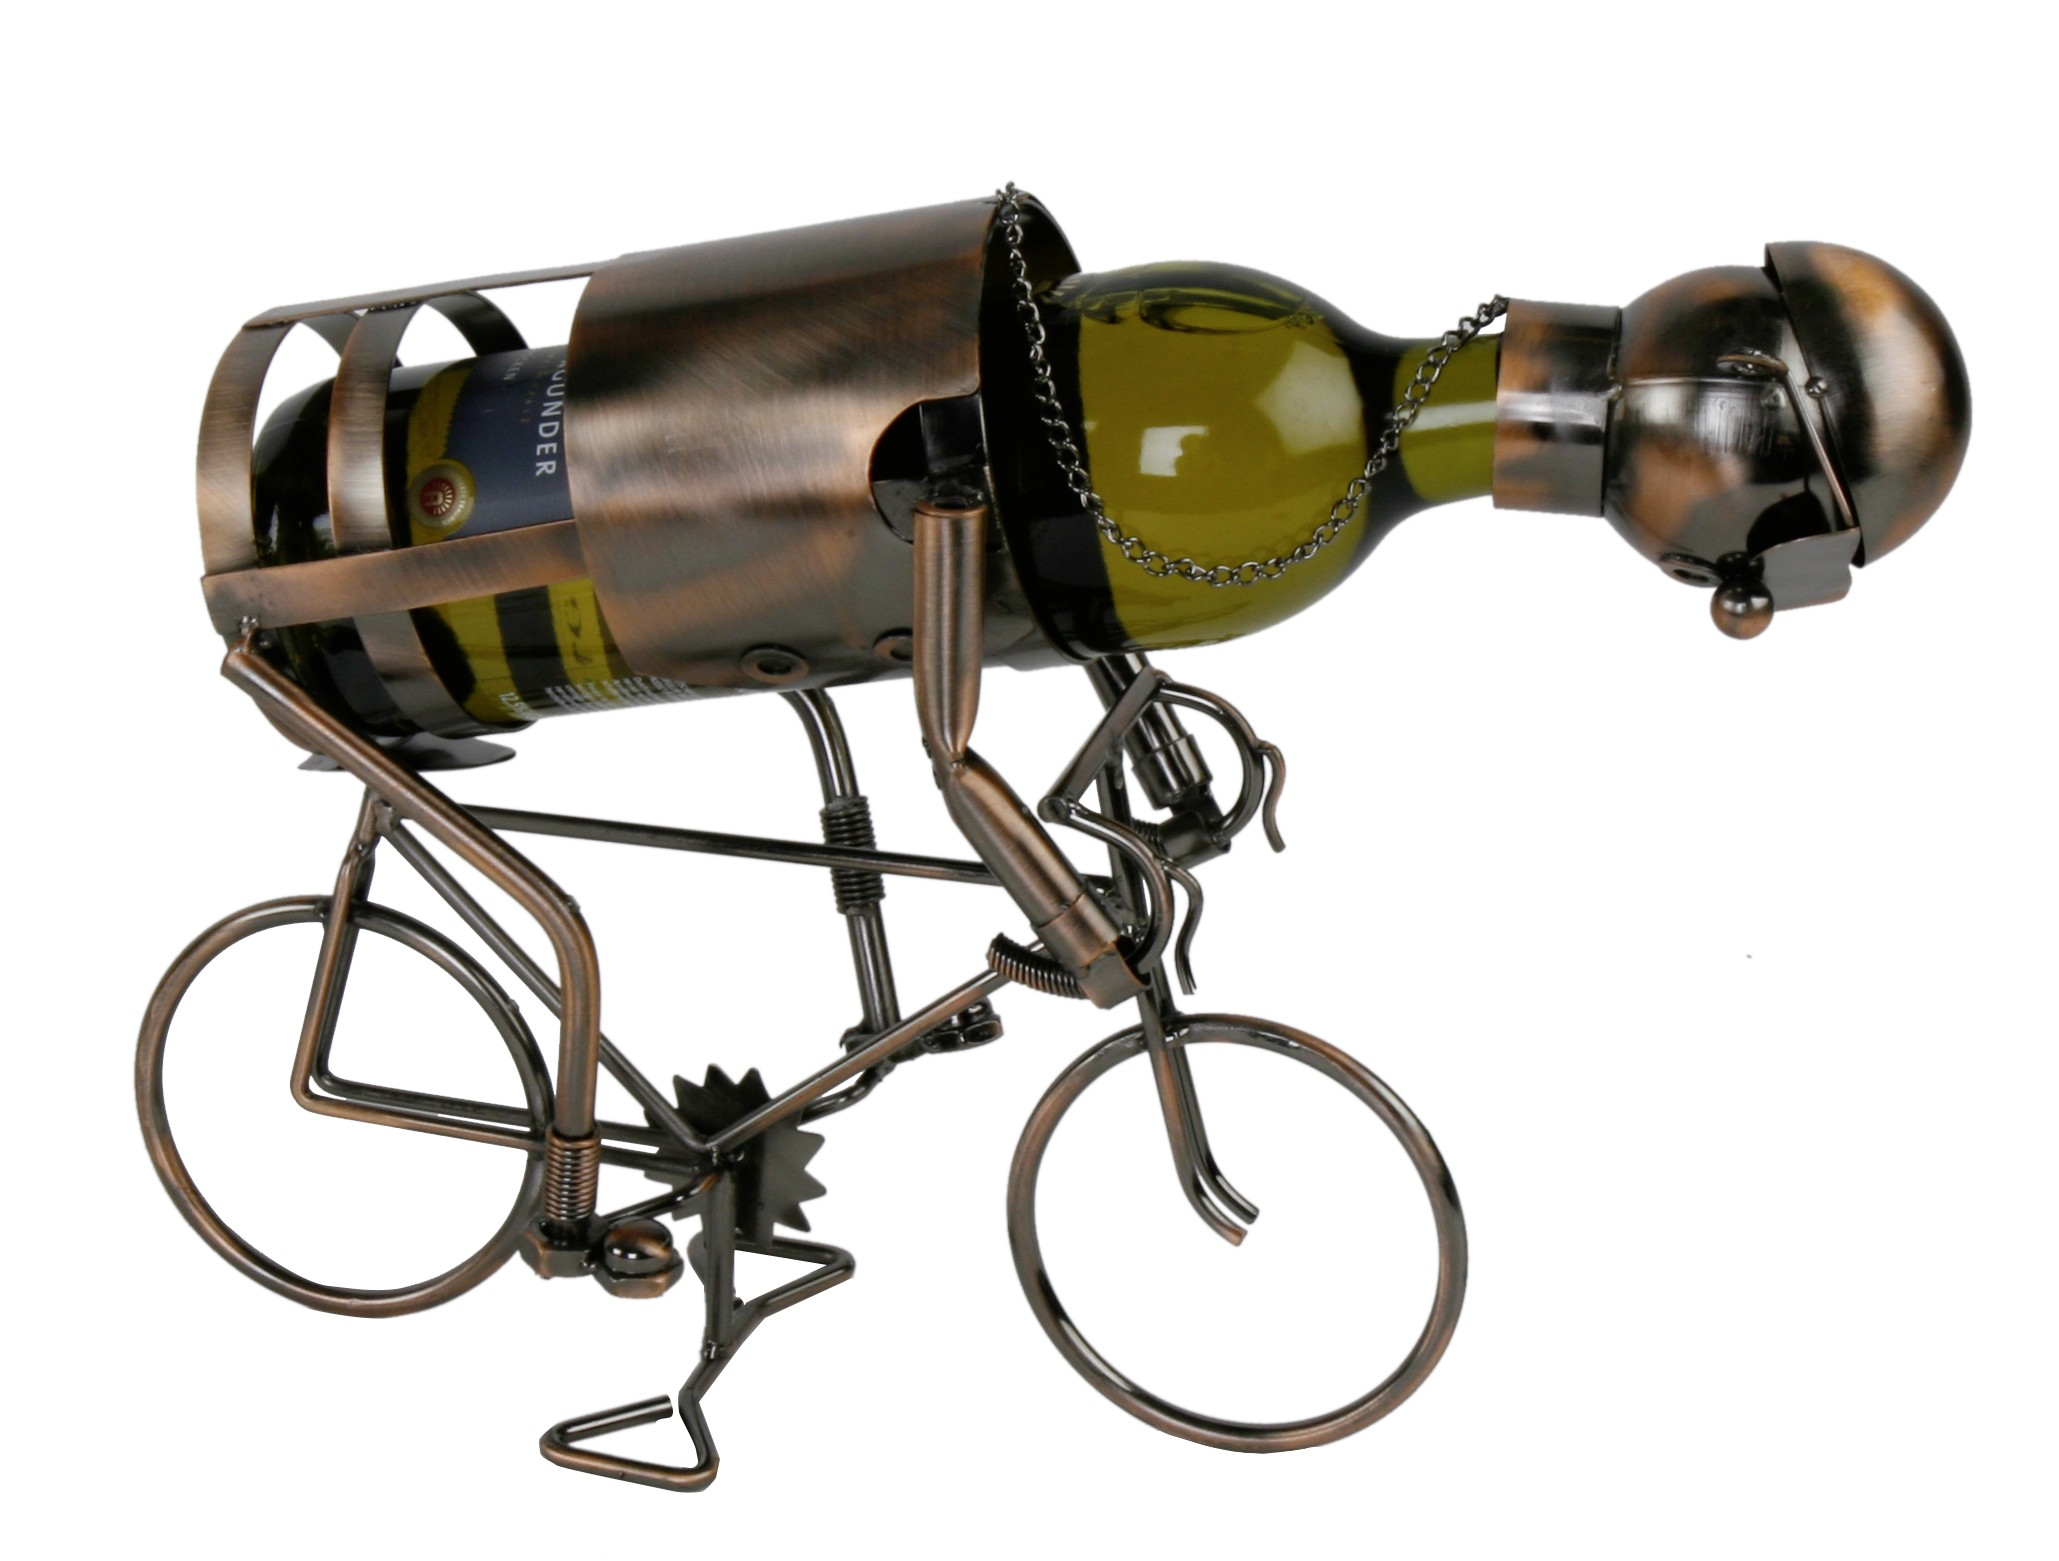 flaschenhalter radfahrer aus metall fahrrad bahnrad. Black Bedroom Furniture Sets. Home Design Ideas